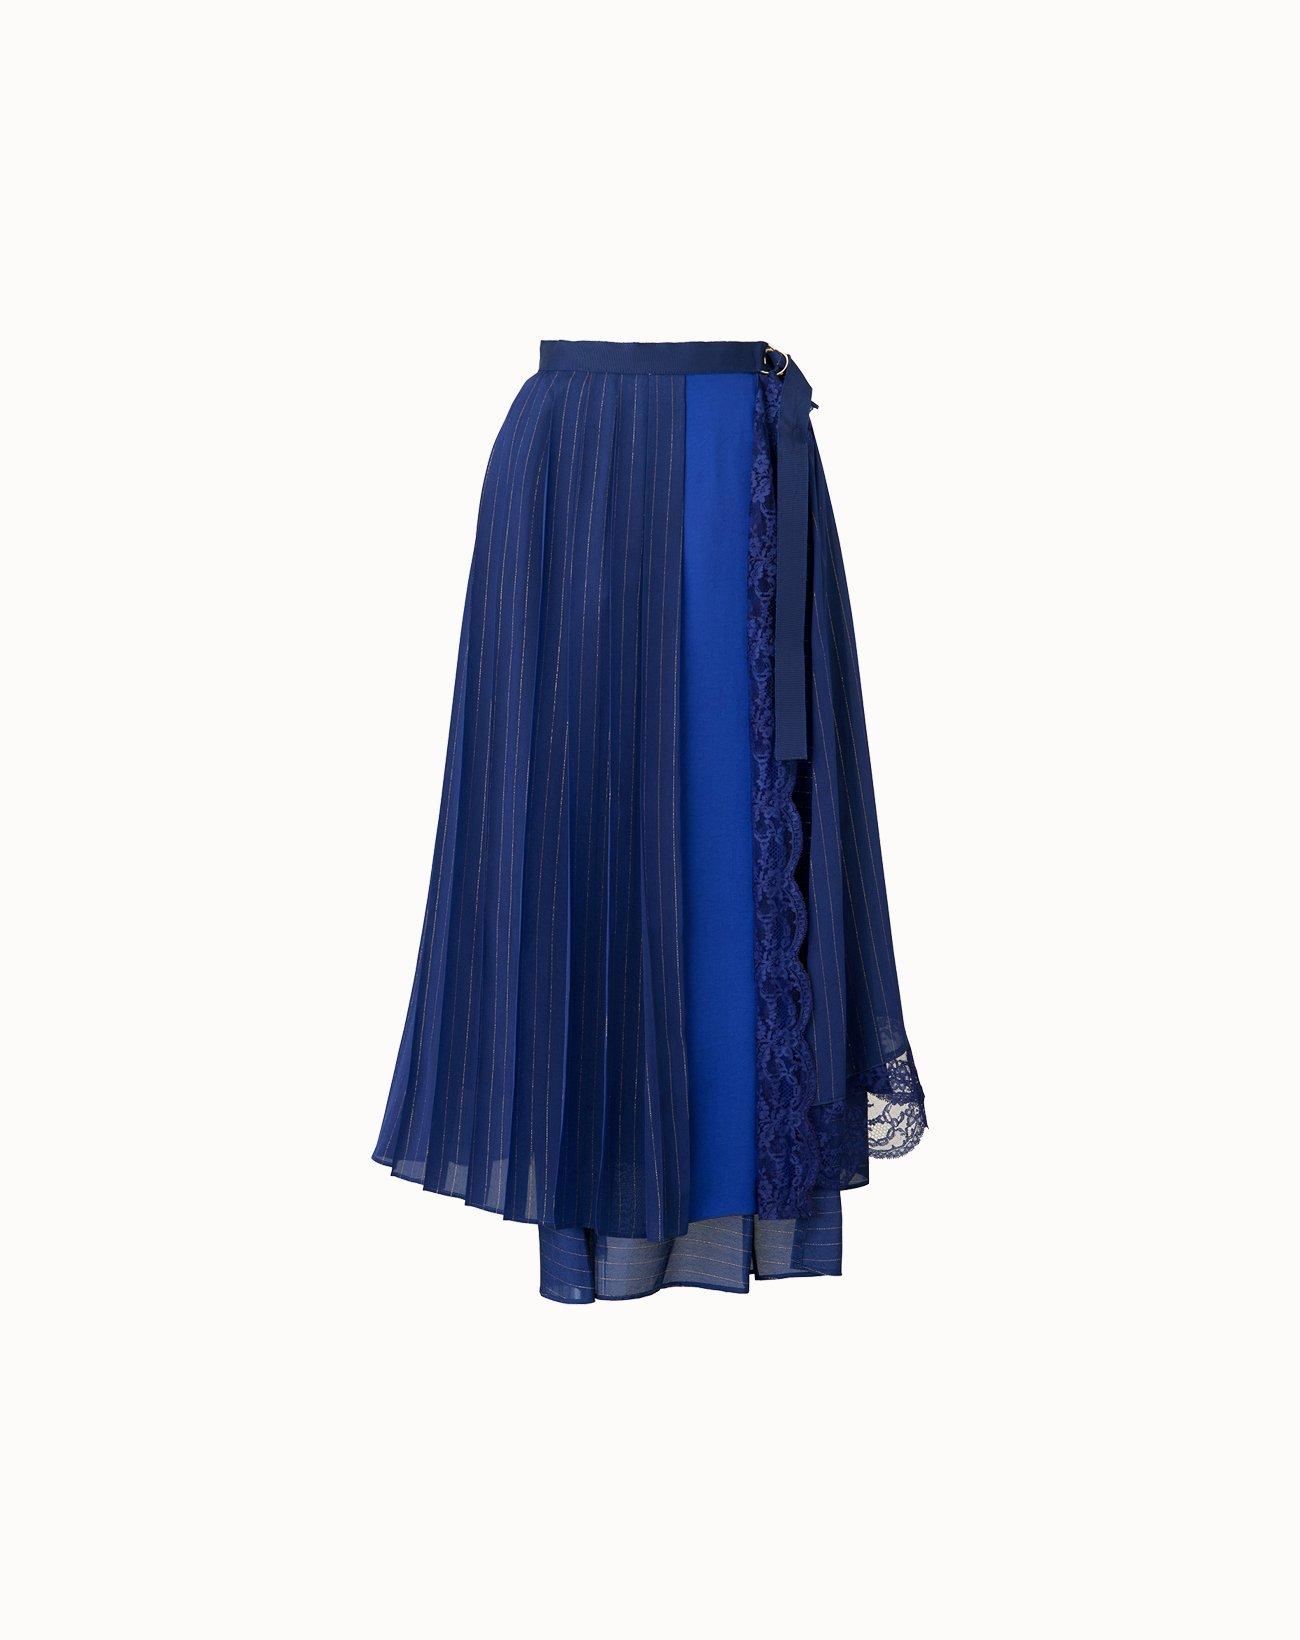 Cupro Stripe Skirt - Navy